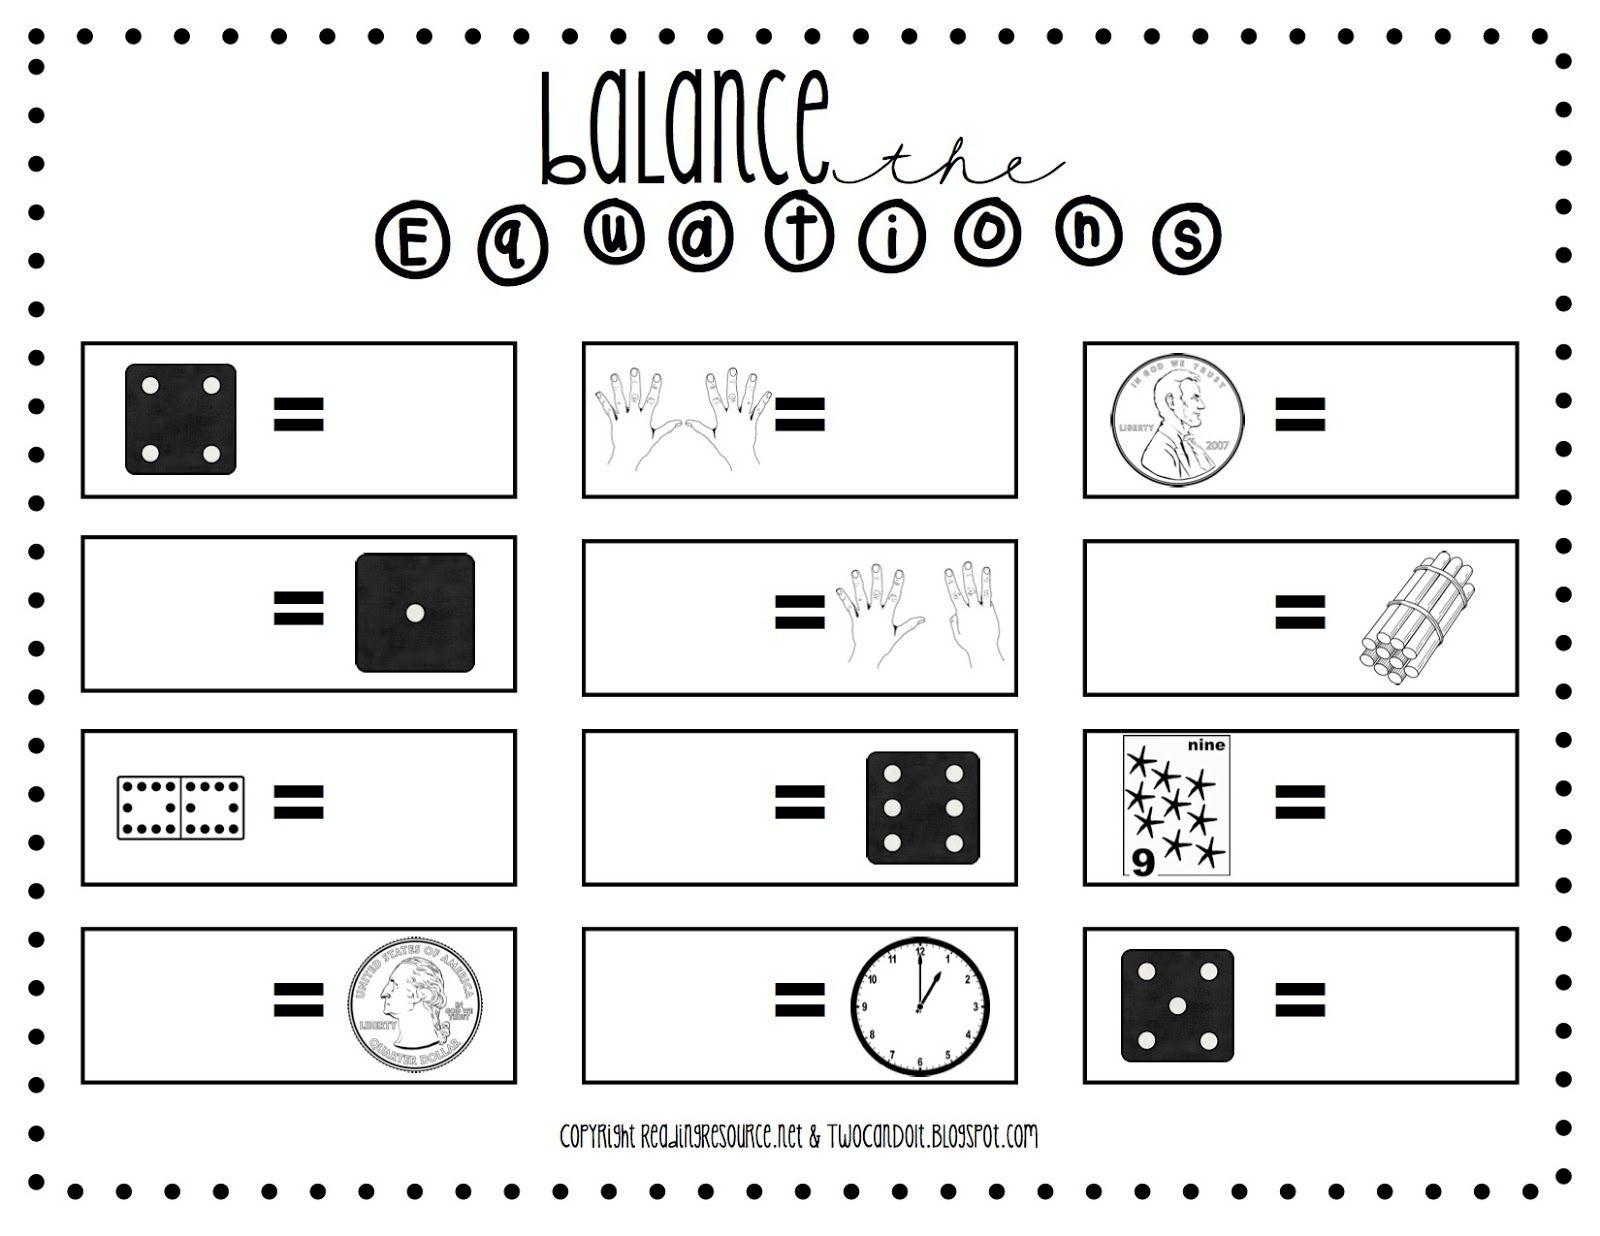 Two Can Do It: Balanced Equations (Worksheet) | School Stuff - Math ...